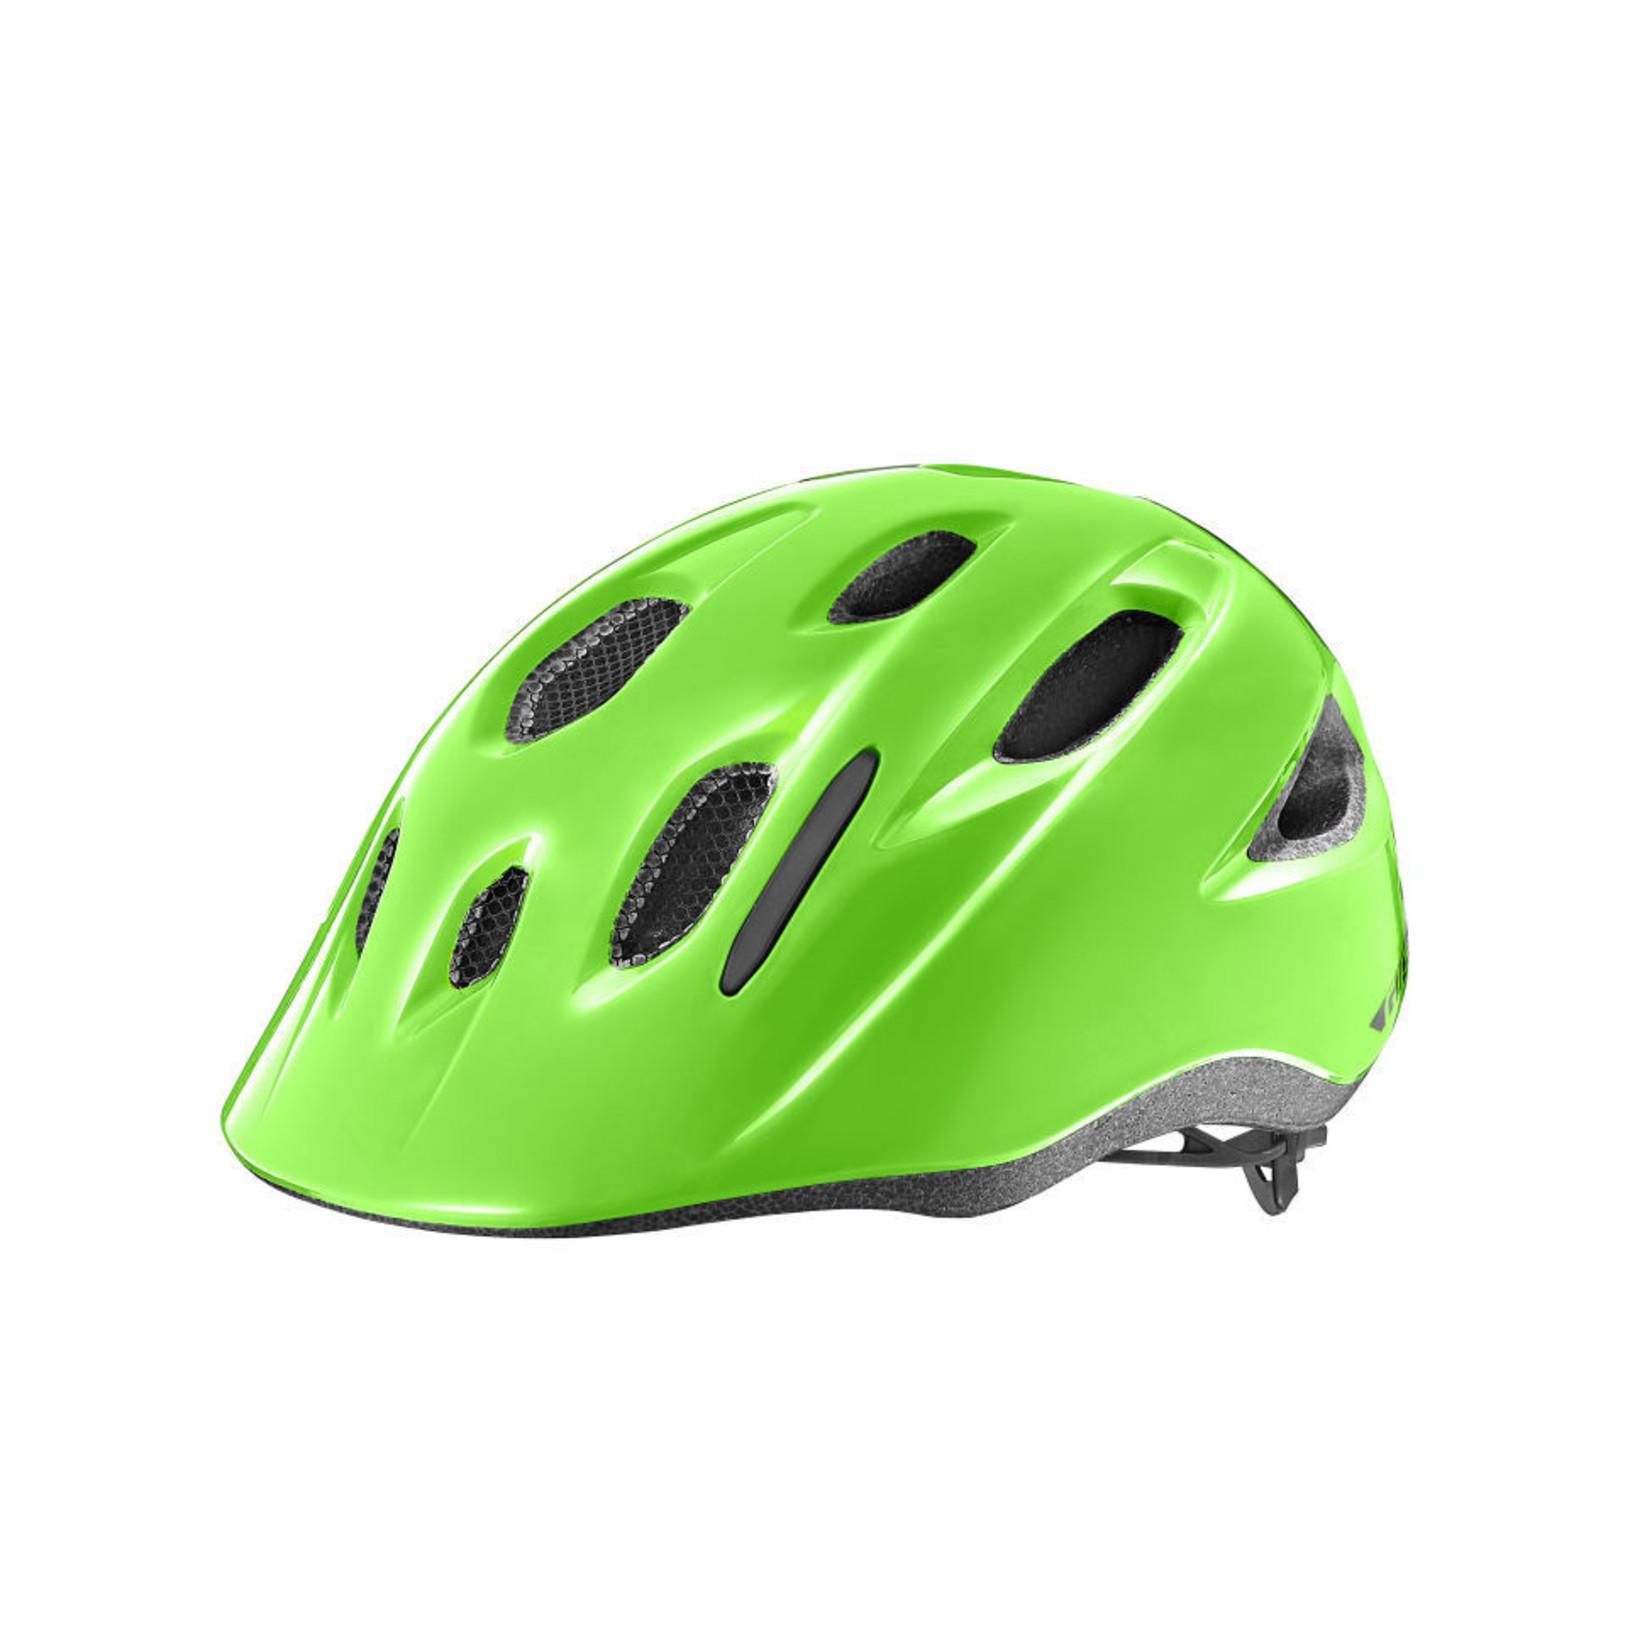 GIANT Giant Hoot ARX Youth Helmet